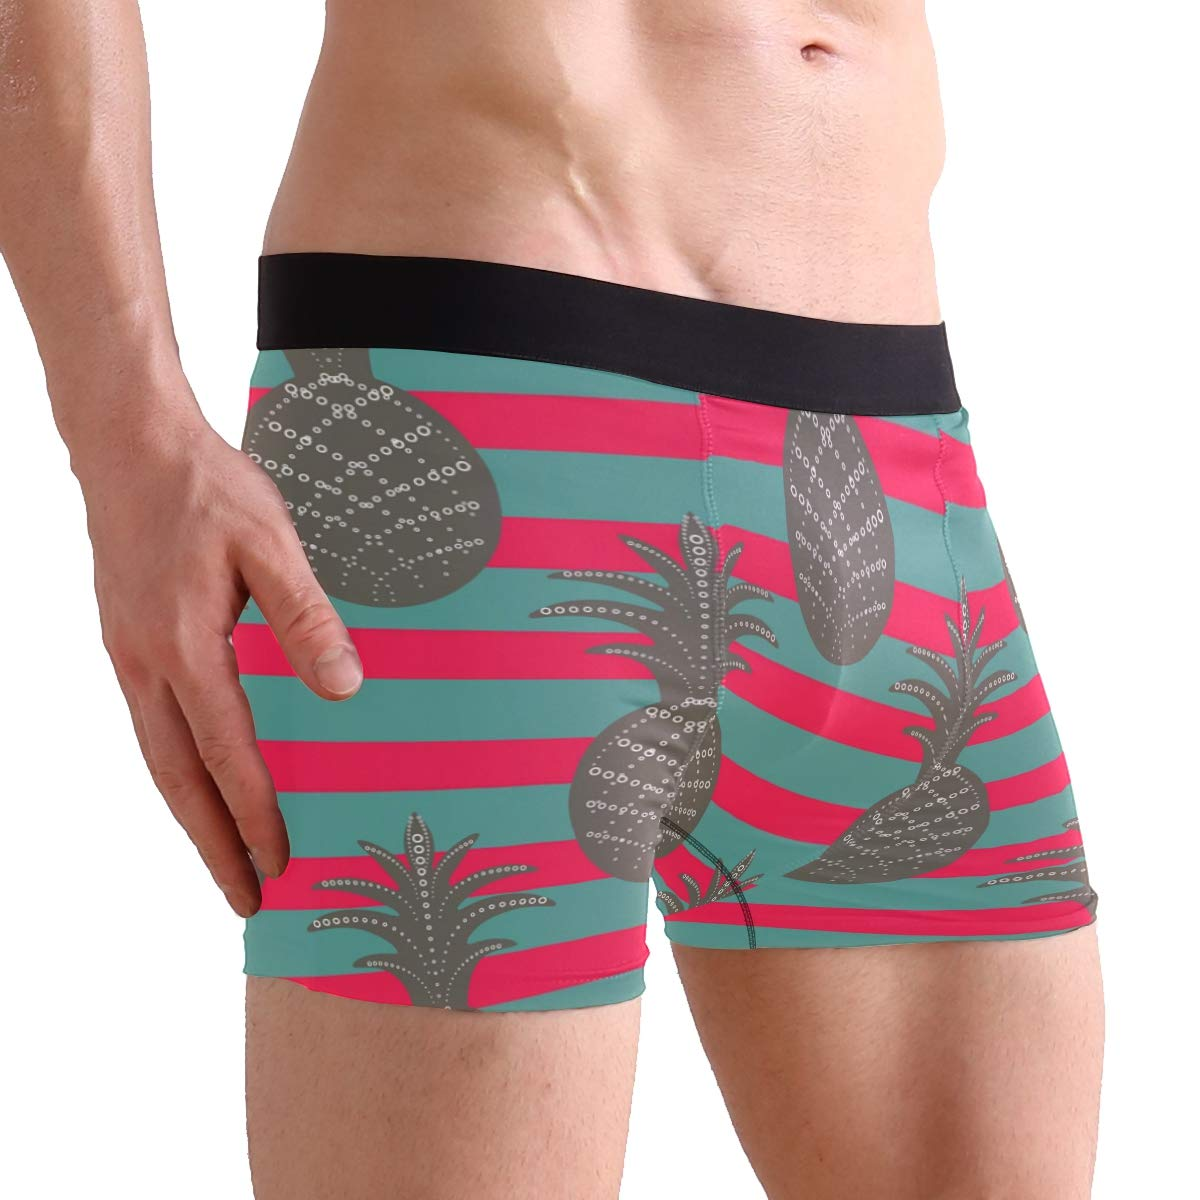 Mens Comfortable Underwear Pineapple Pattern Boxer Briefs for Men